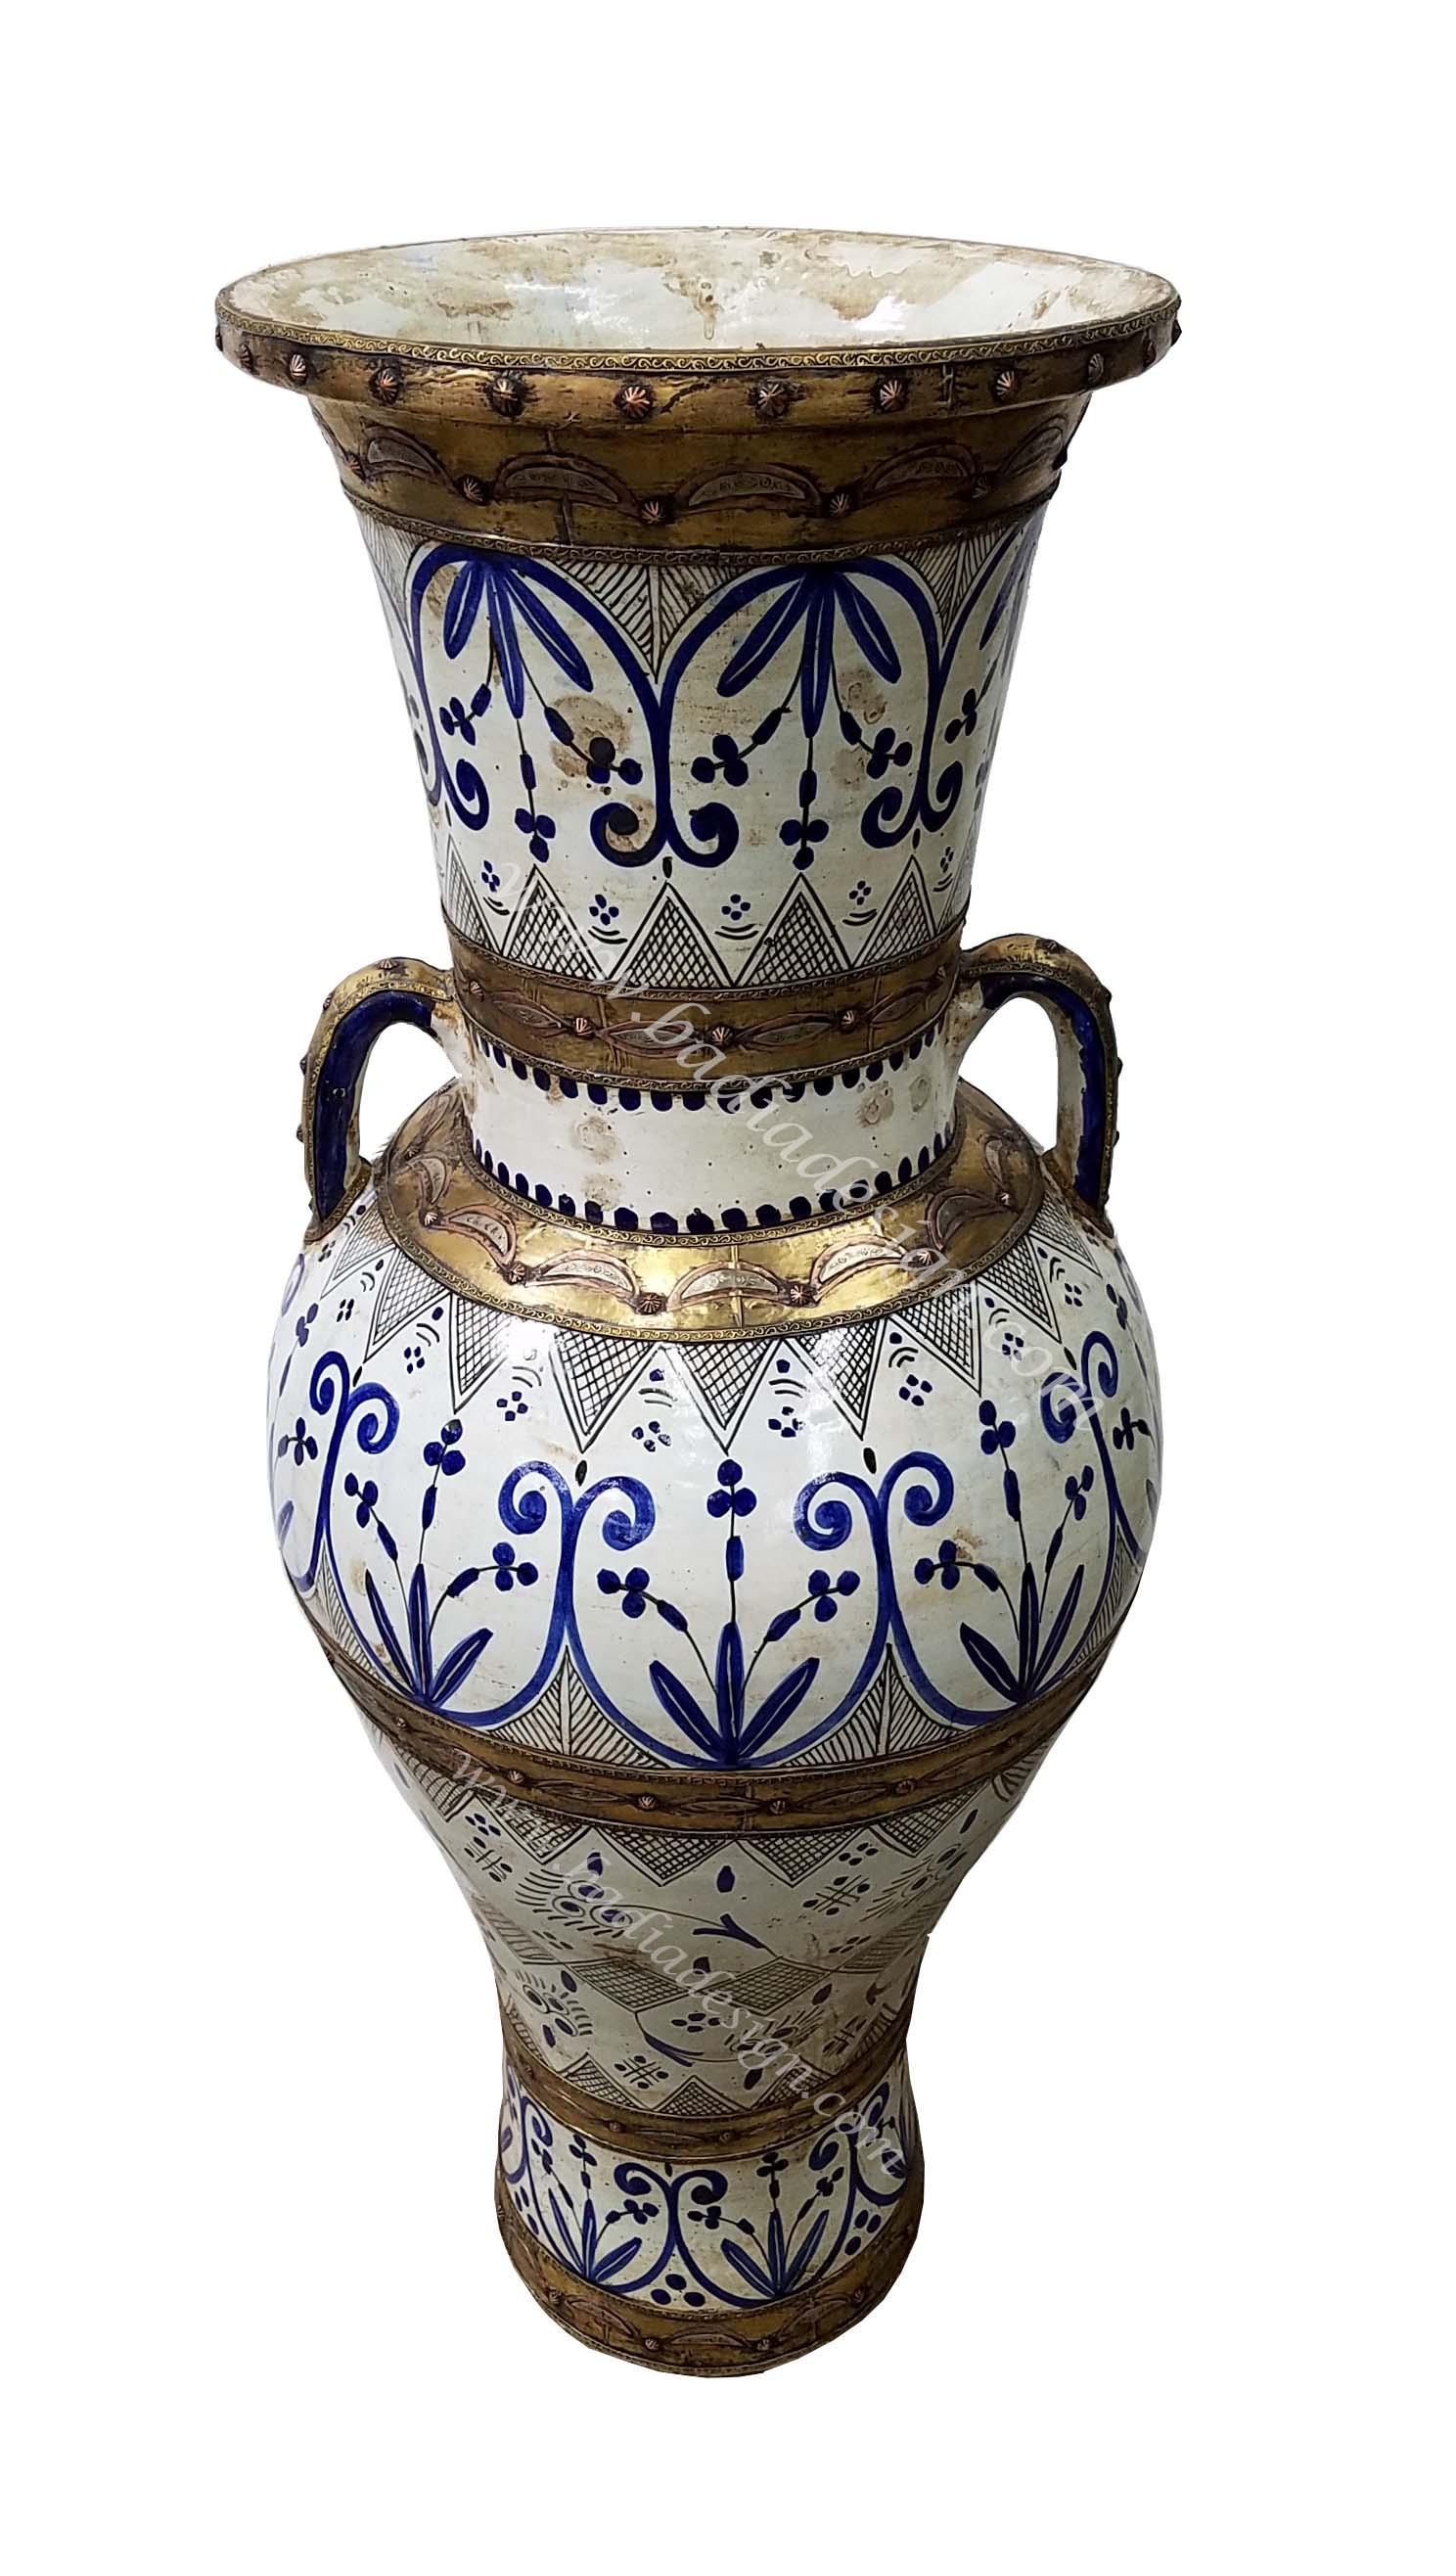 moroccan-blue-and-white-ceramic-urn-va066.jpg